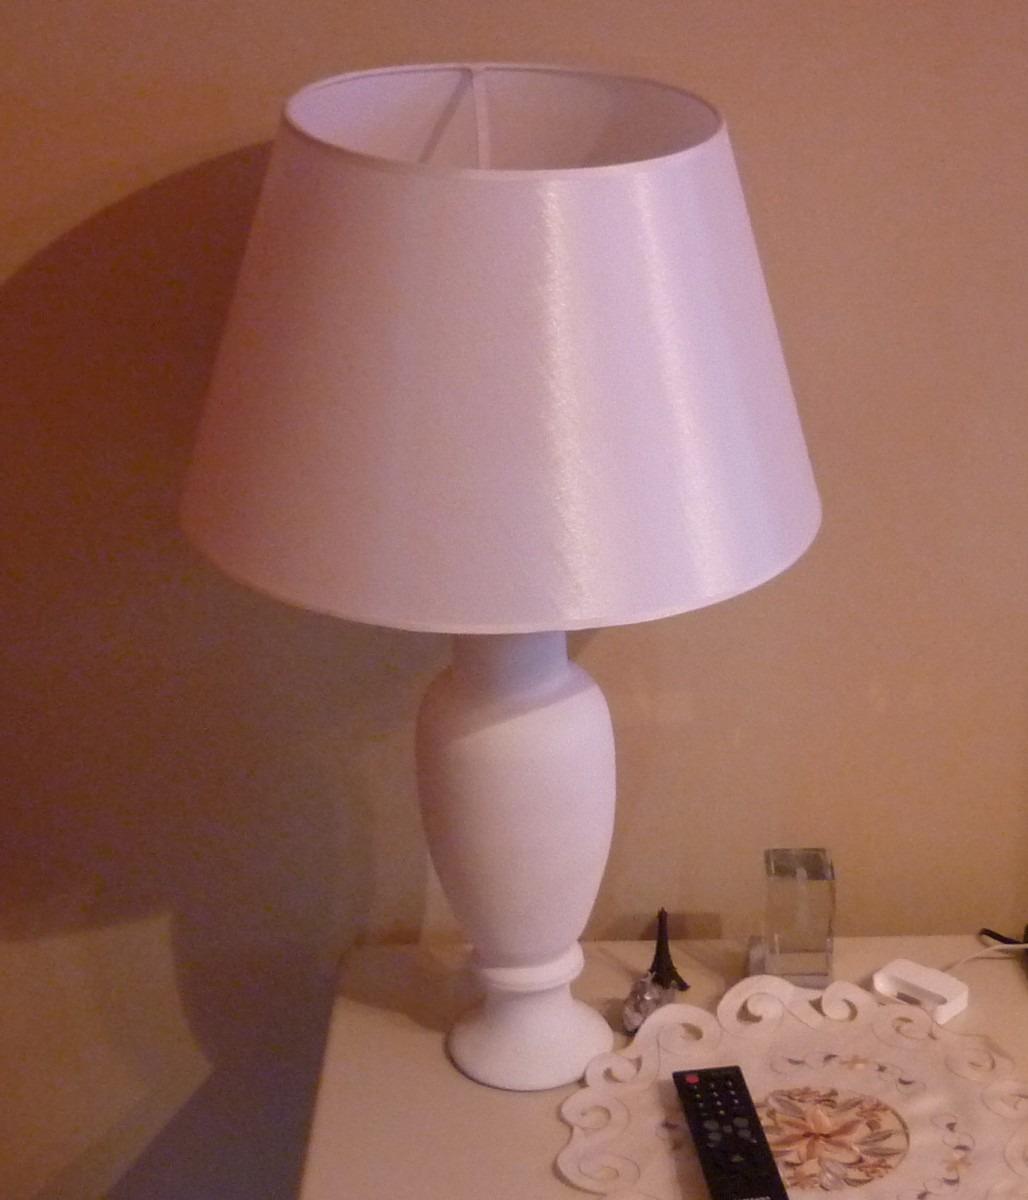 lamparas velador dormitorio blancas con pantallas